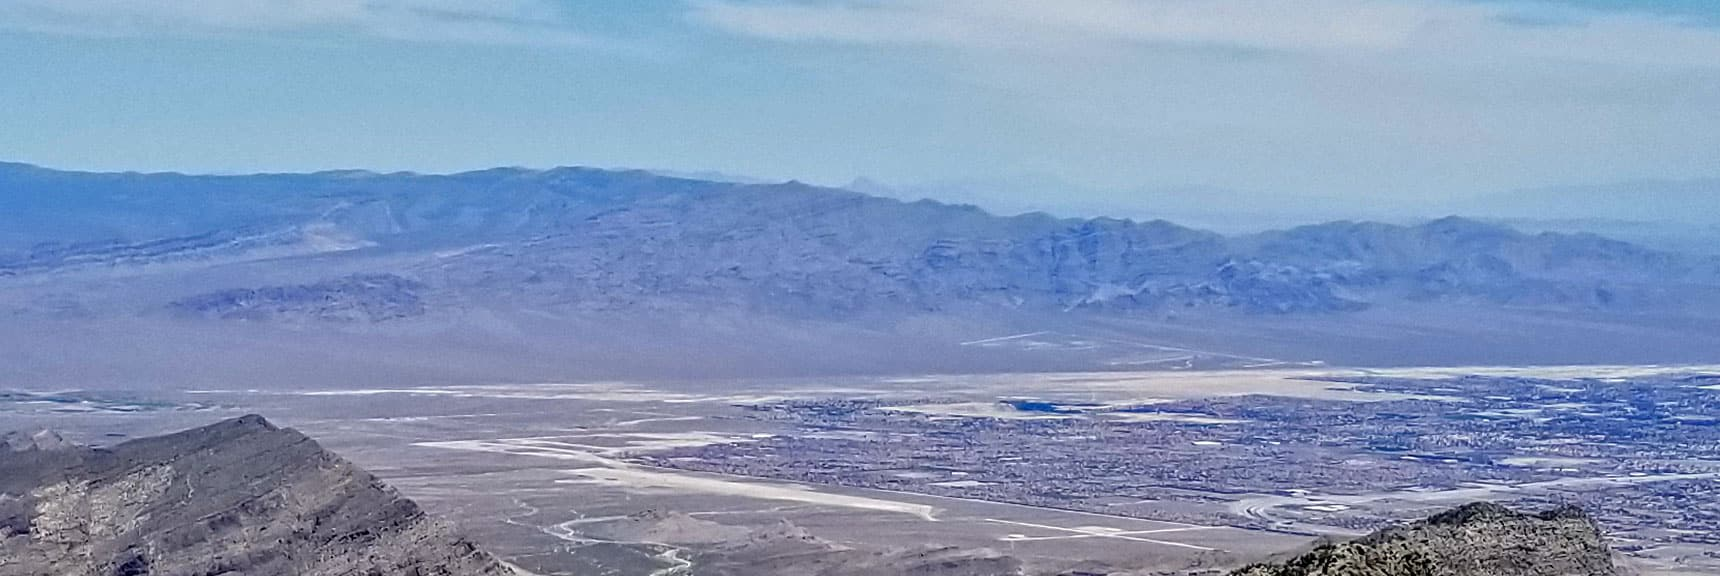 Sheep Range from La Madre Mountain Summit | La Madre Mountain Northern Approach, Nevada